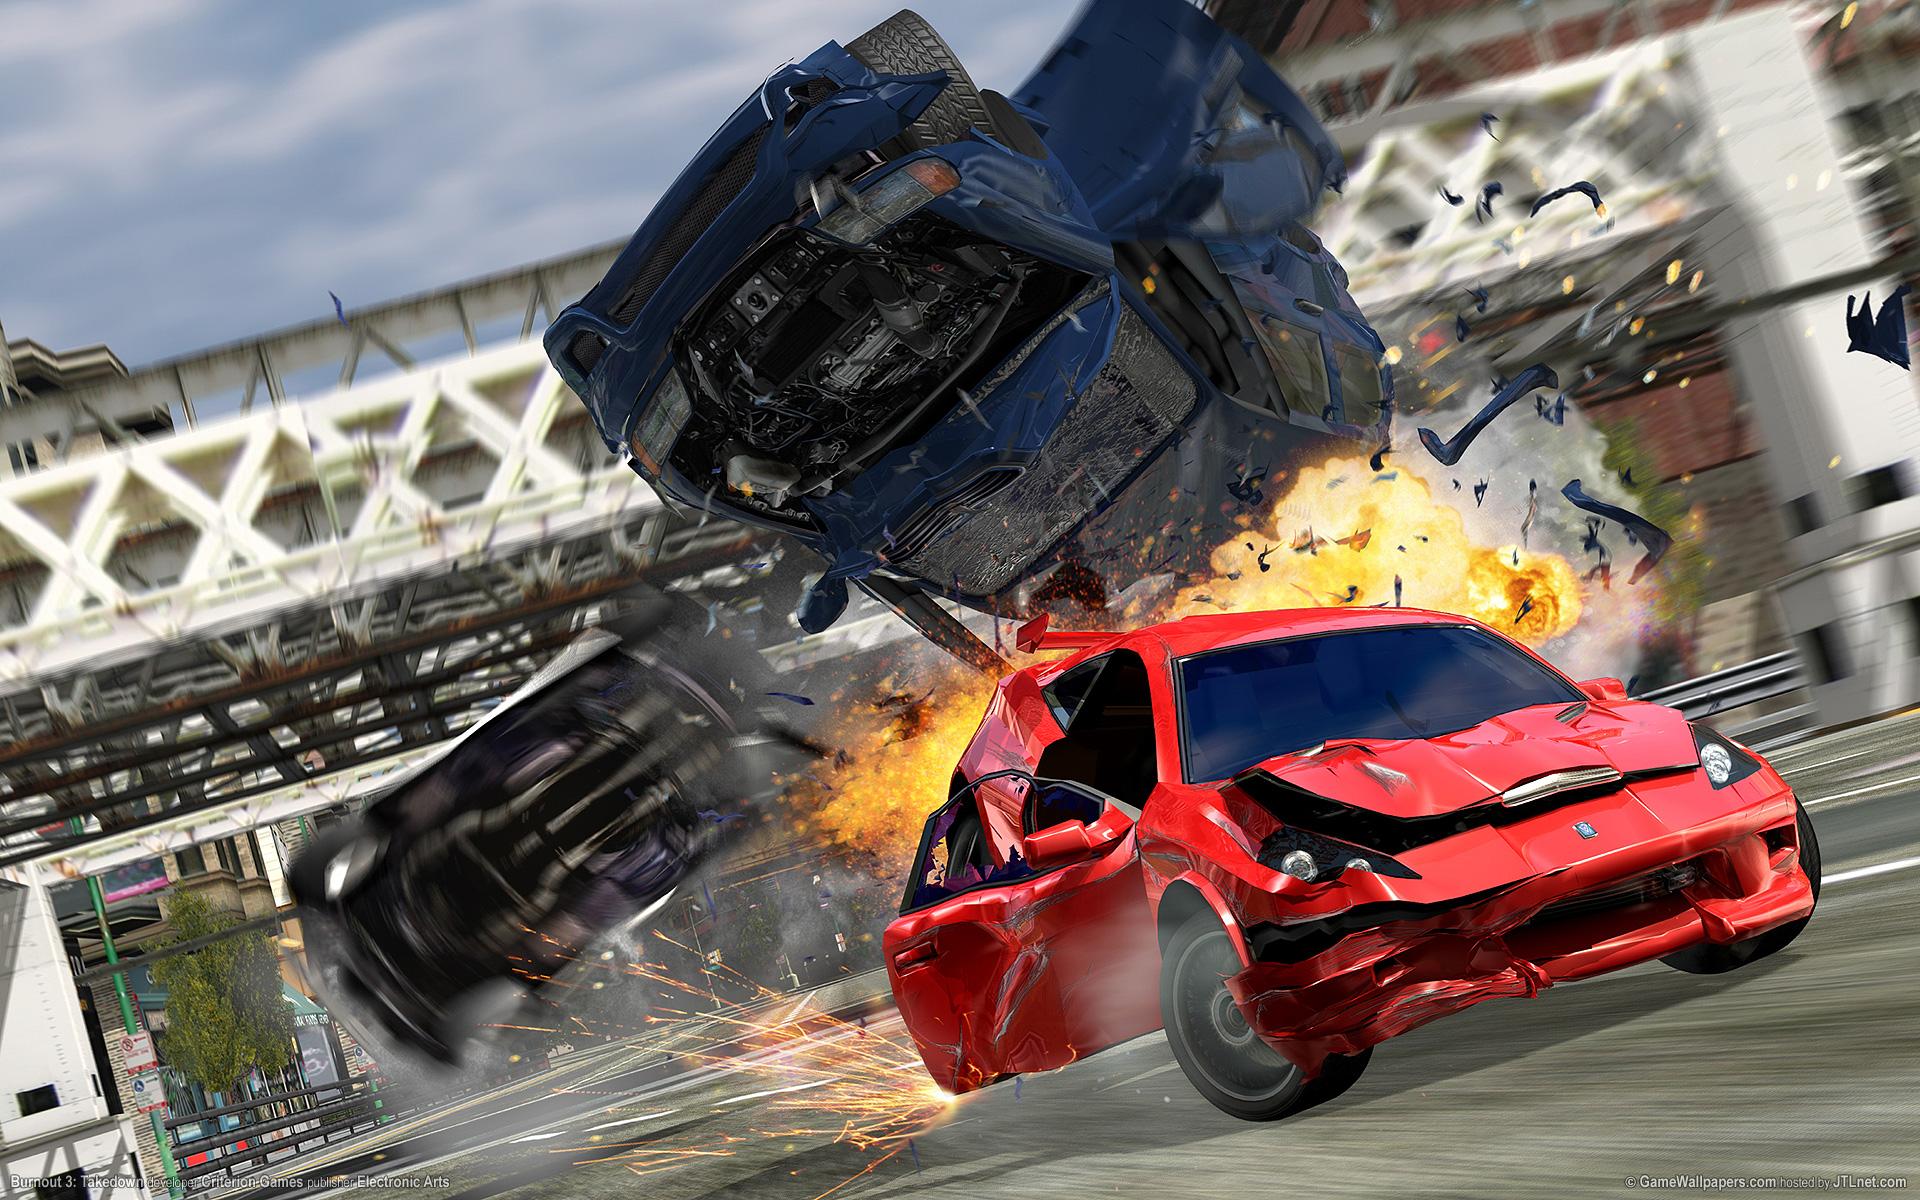 Burnout 3: Takedown wallpapers, Video Game, HQ Burnout 3